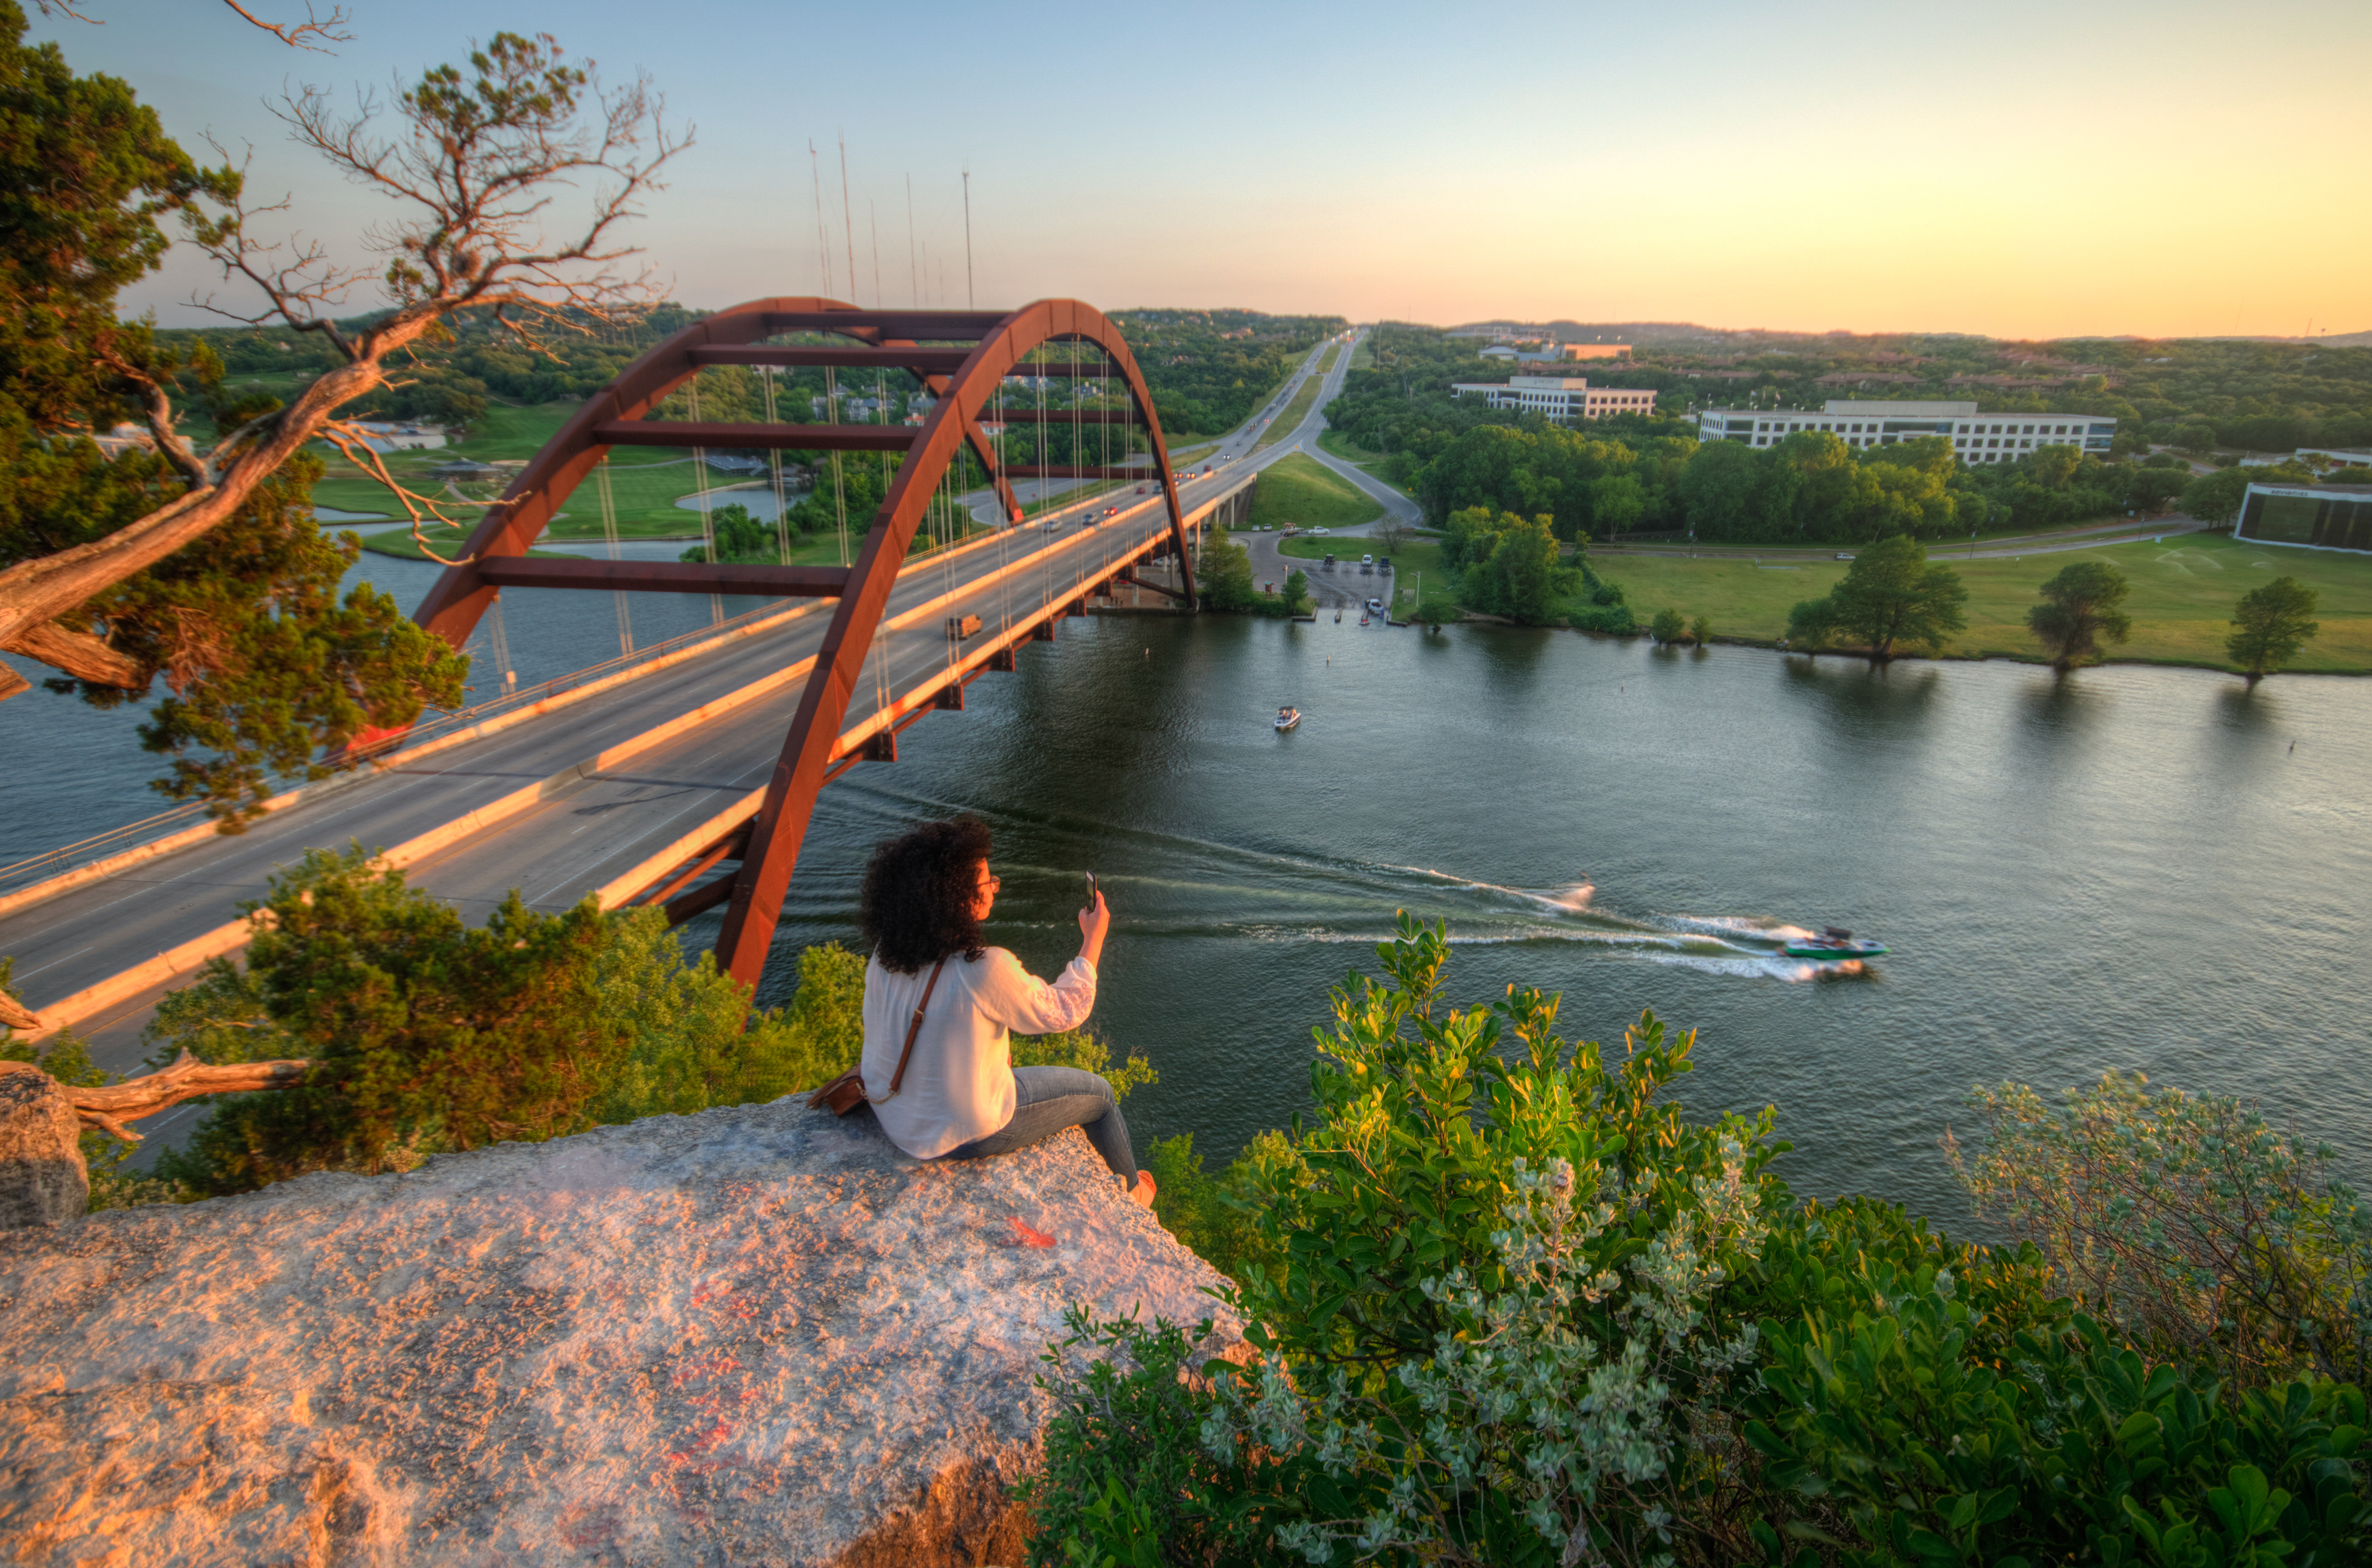 South River City, Austin, Tx, Usa Sunrise Sunset Times Within Sunrise Sunset Times Austin Texas